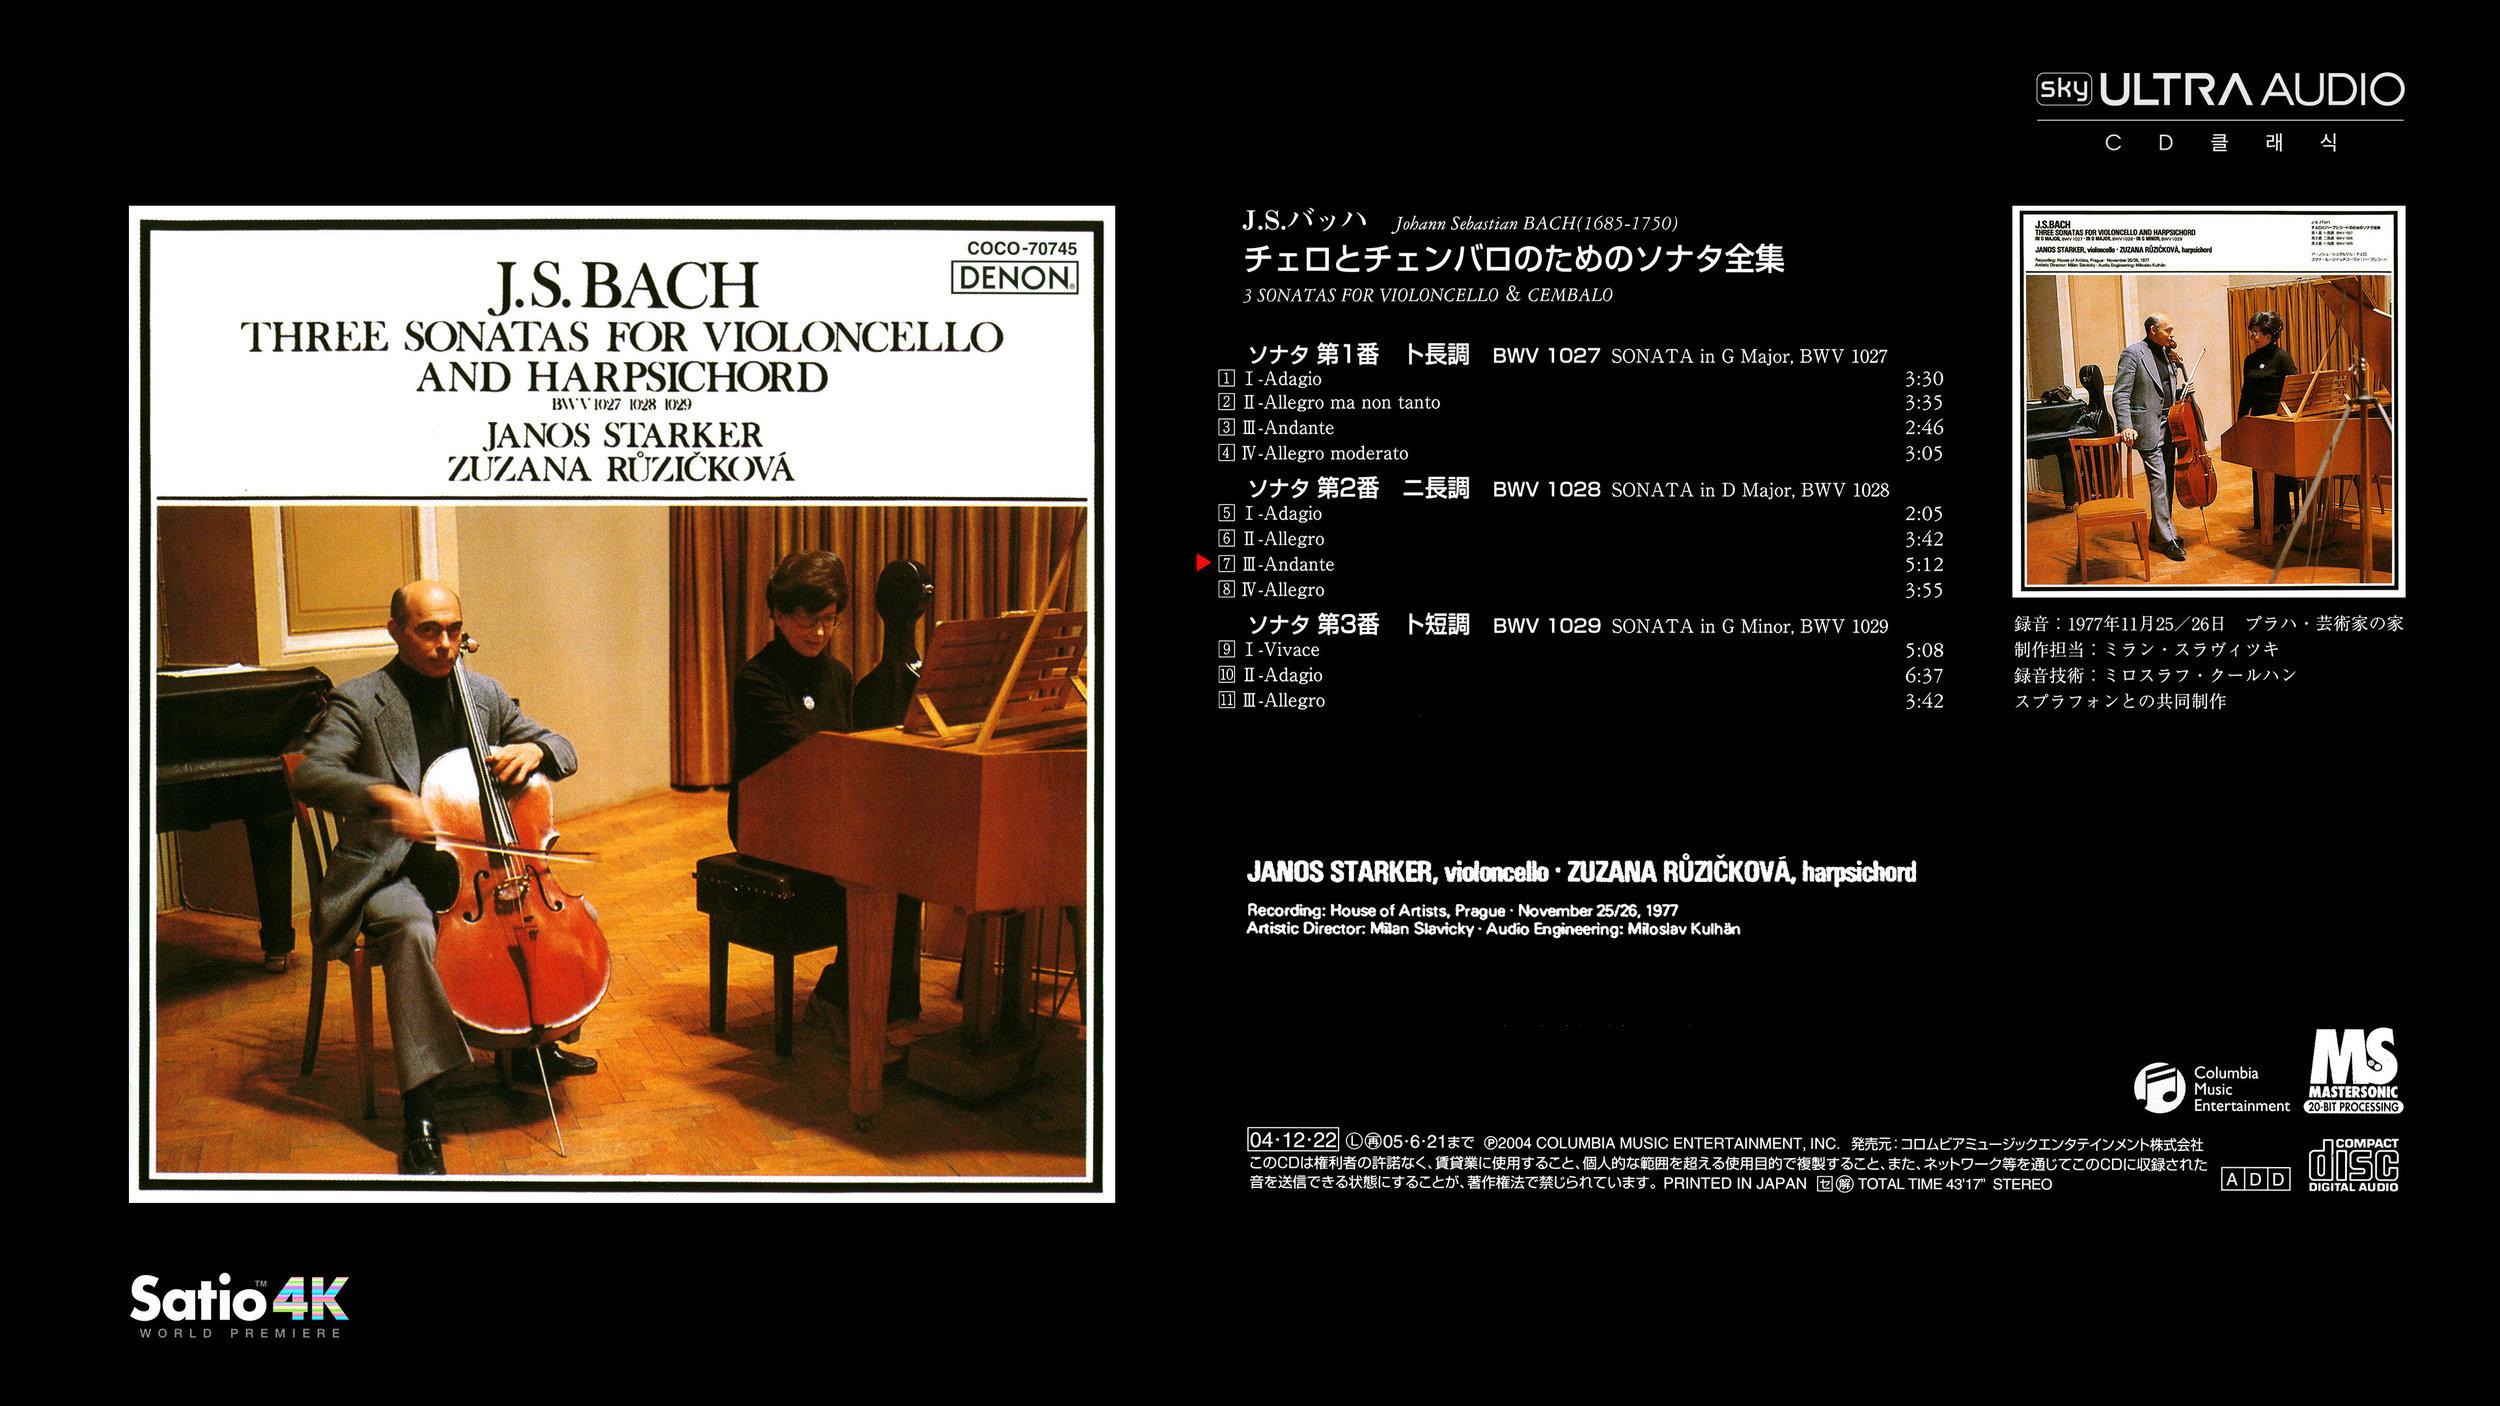 07_Janos Starker_Bach 3 SNTs For Cello & Harpsichord (1977)_07_4216.jpg